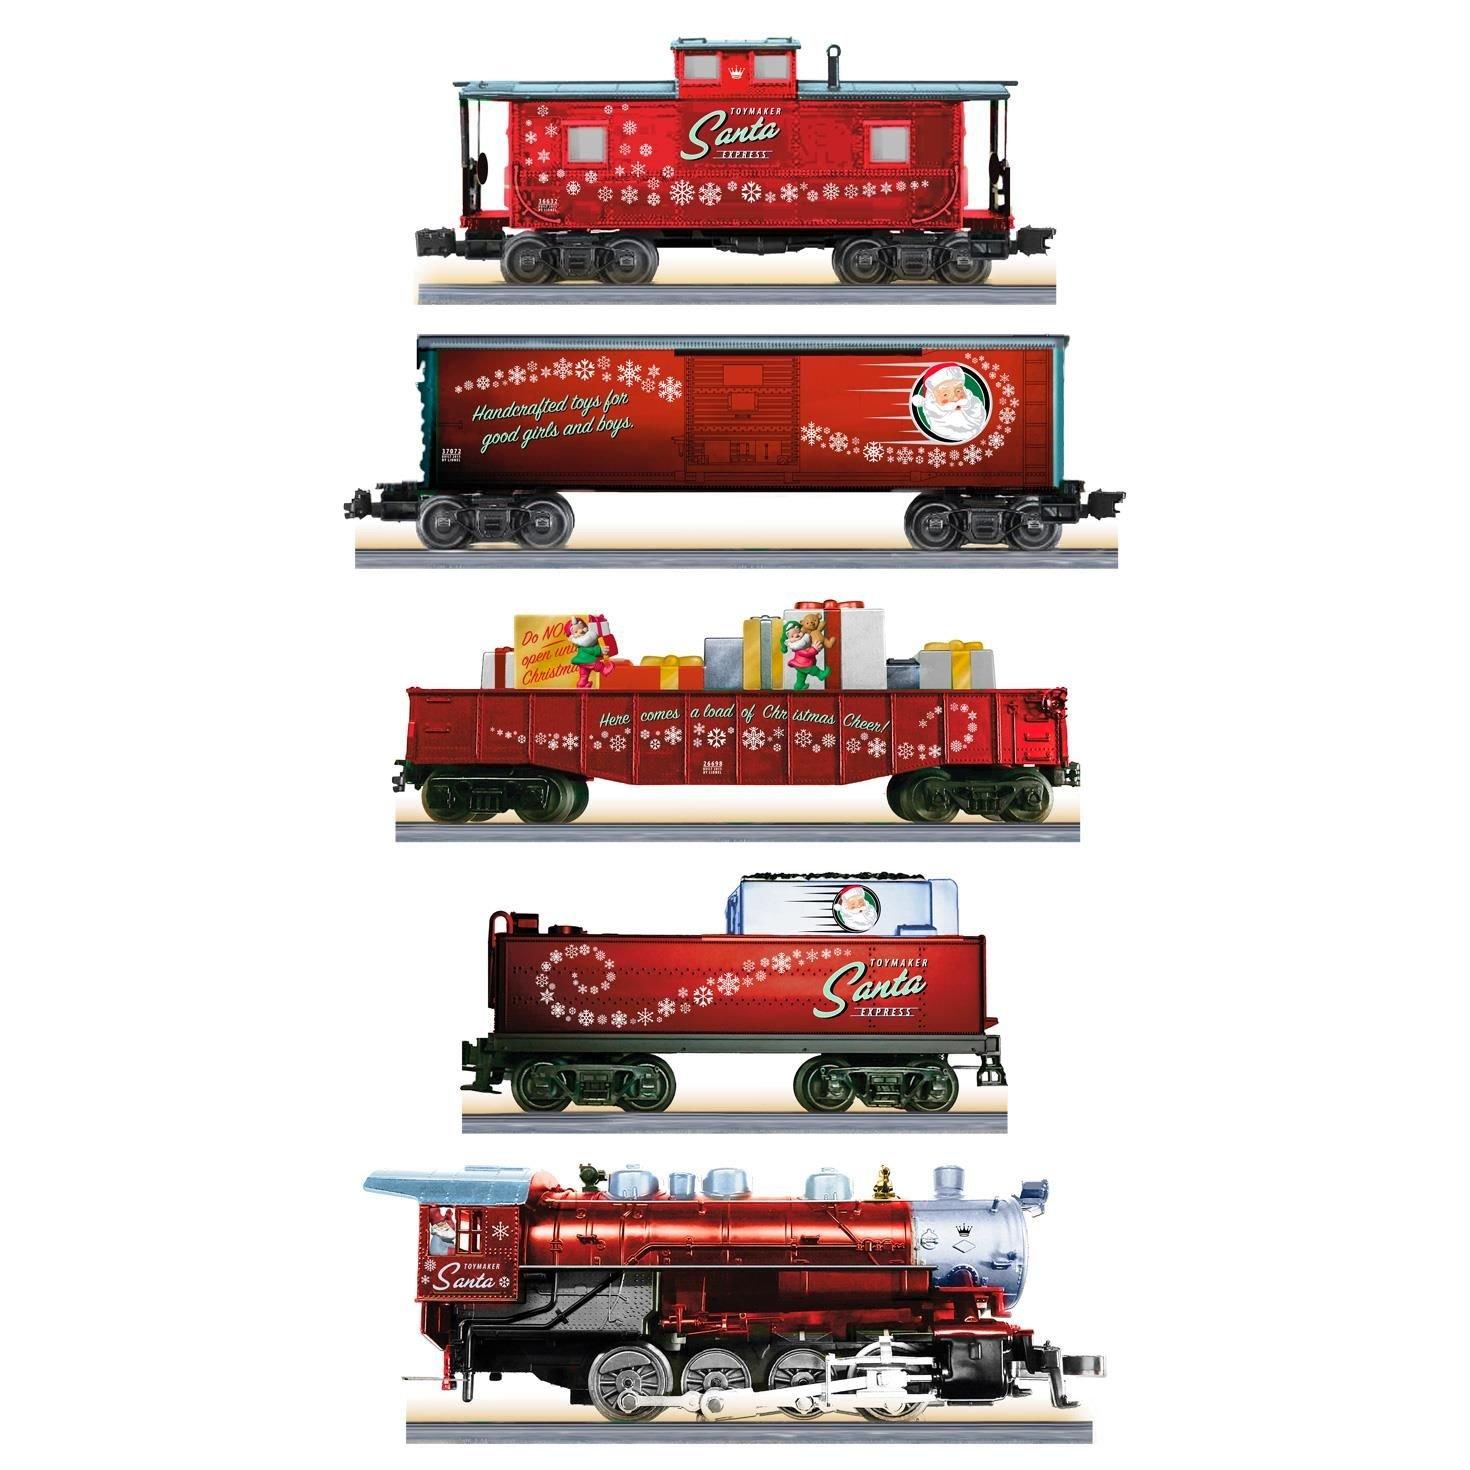 Amazon.com: Hallmark Lionel Toymaker Santa Express Complete Ready-to ...